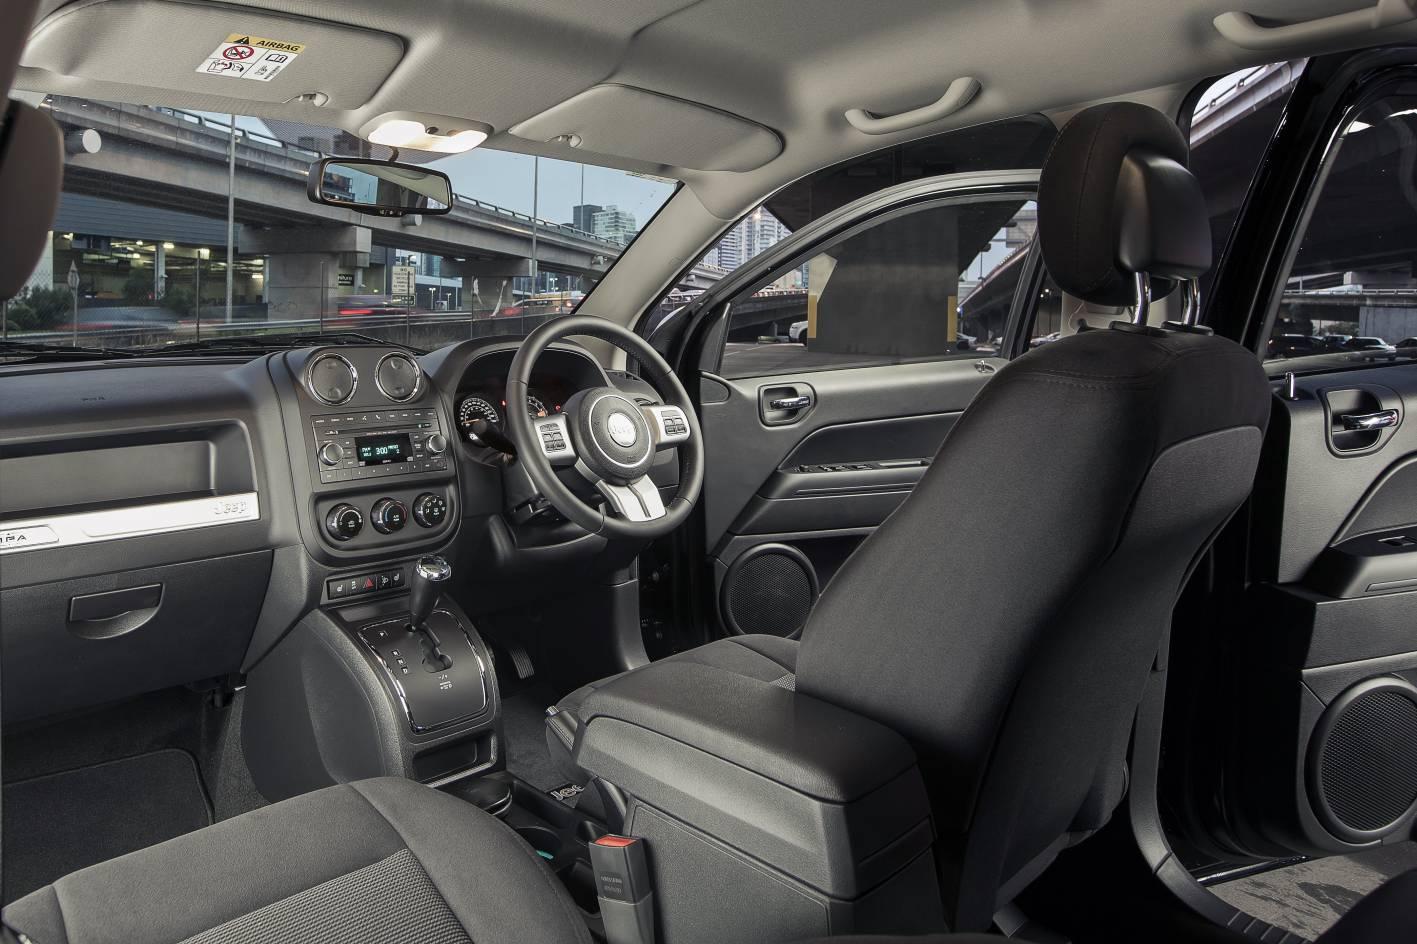 Jeep Patriot Review: 2015 Patriot Blackhawk